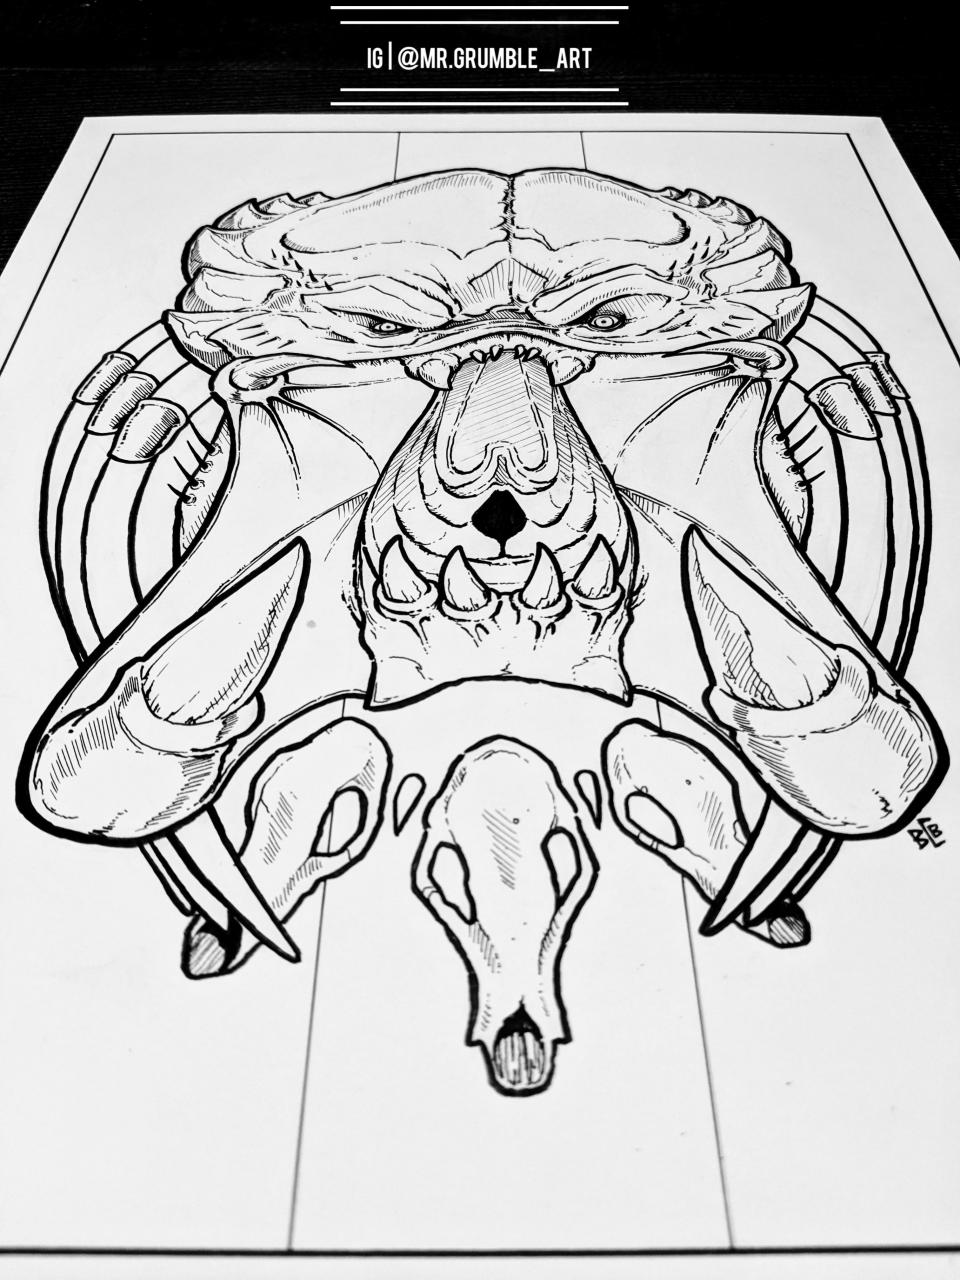 Predator tattoo concept. Hope you like it! IG @Mr.Grumble_Art. 🤘